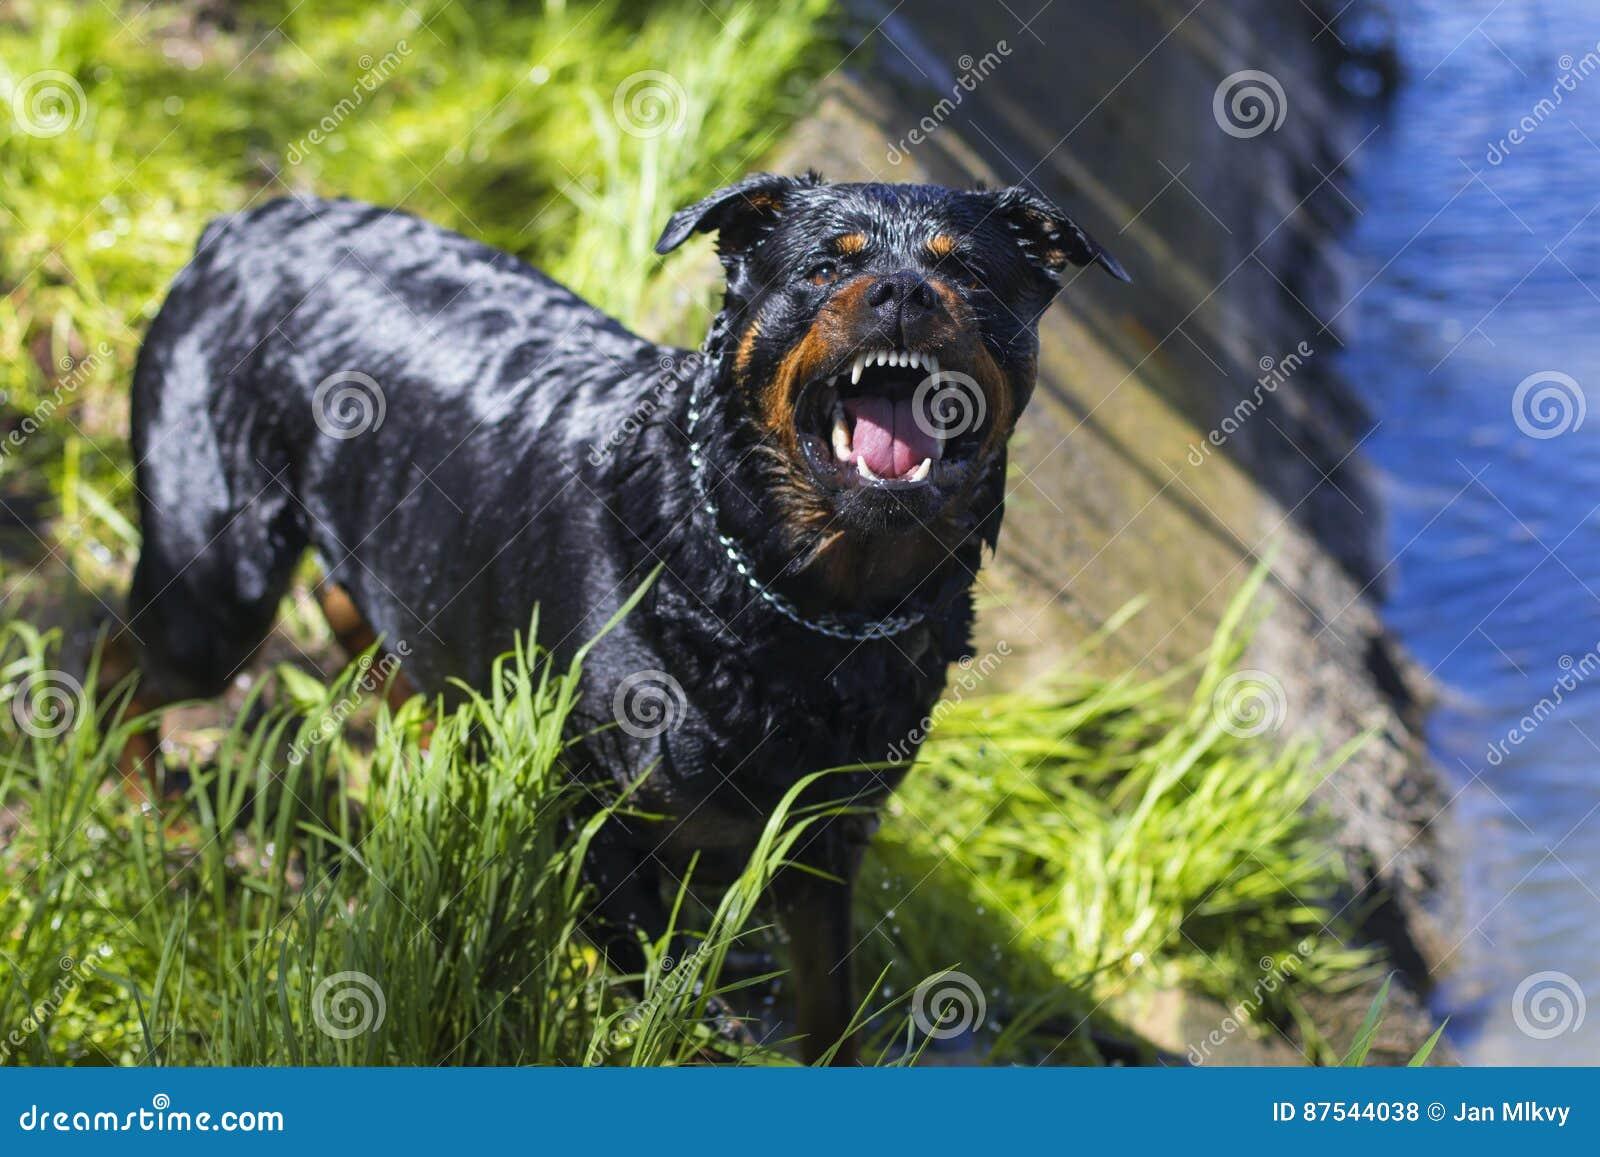 Rottweiler Barking And Baring Teeth Royalty Free Stock Photos Angry Dog